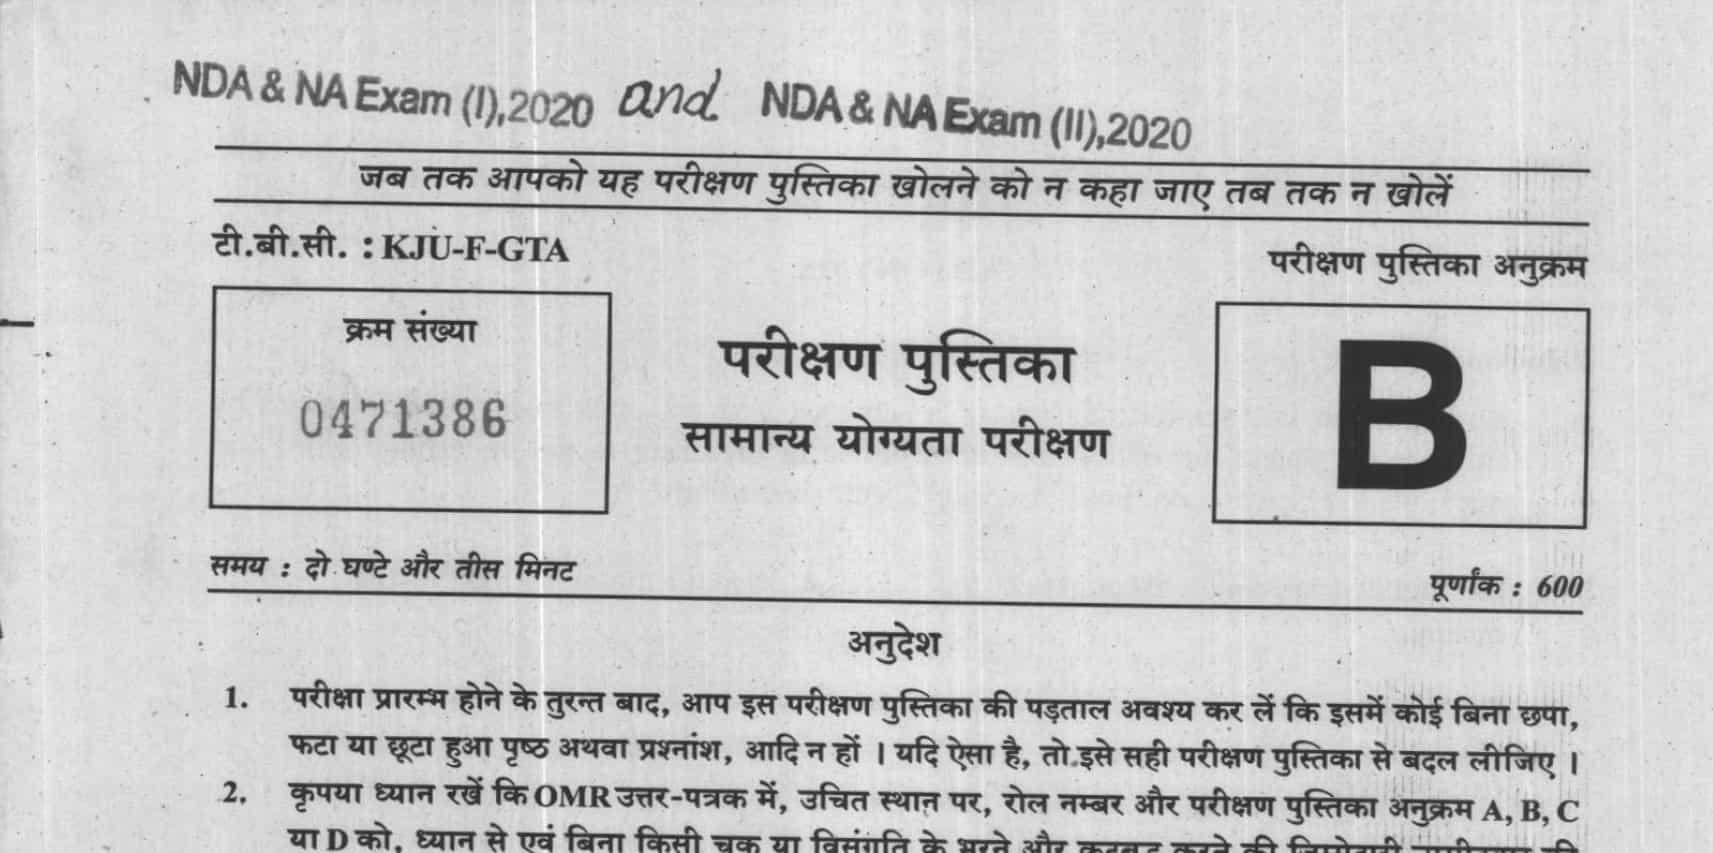 UPSC NDA NA 1 and 2 Question paper 2020